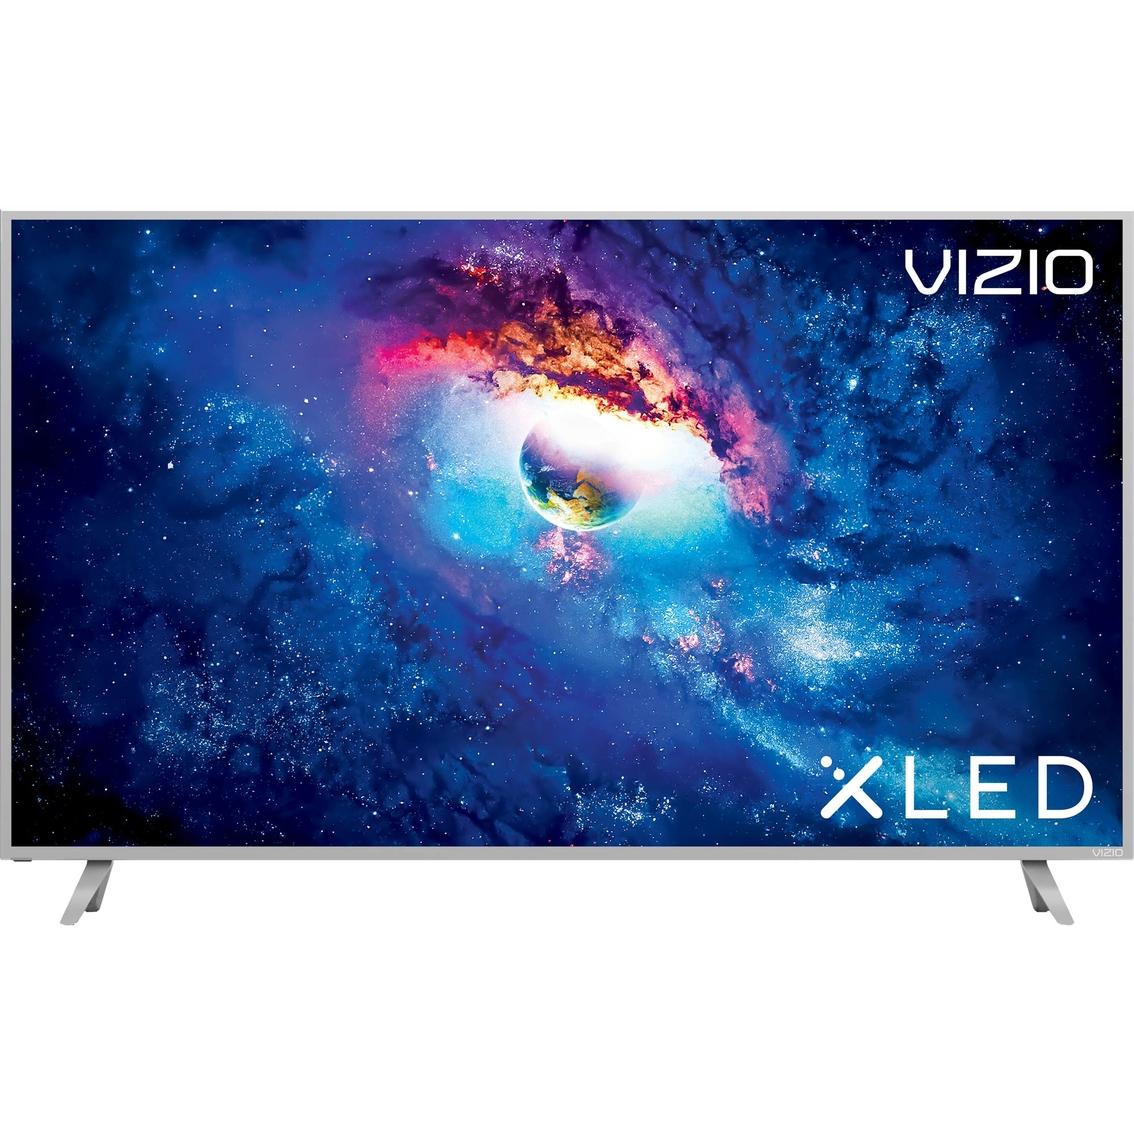 "* AAFES / MILITARY ONLY * 65"" Vizio SmartCast P65-E1 4K XLED Pro Chromecast Display $899"